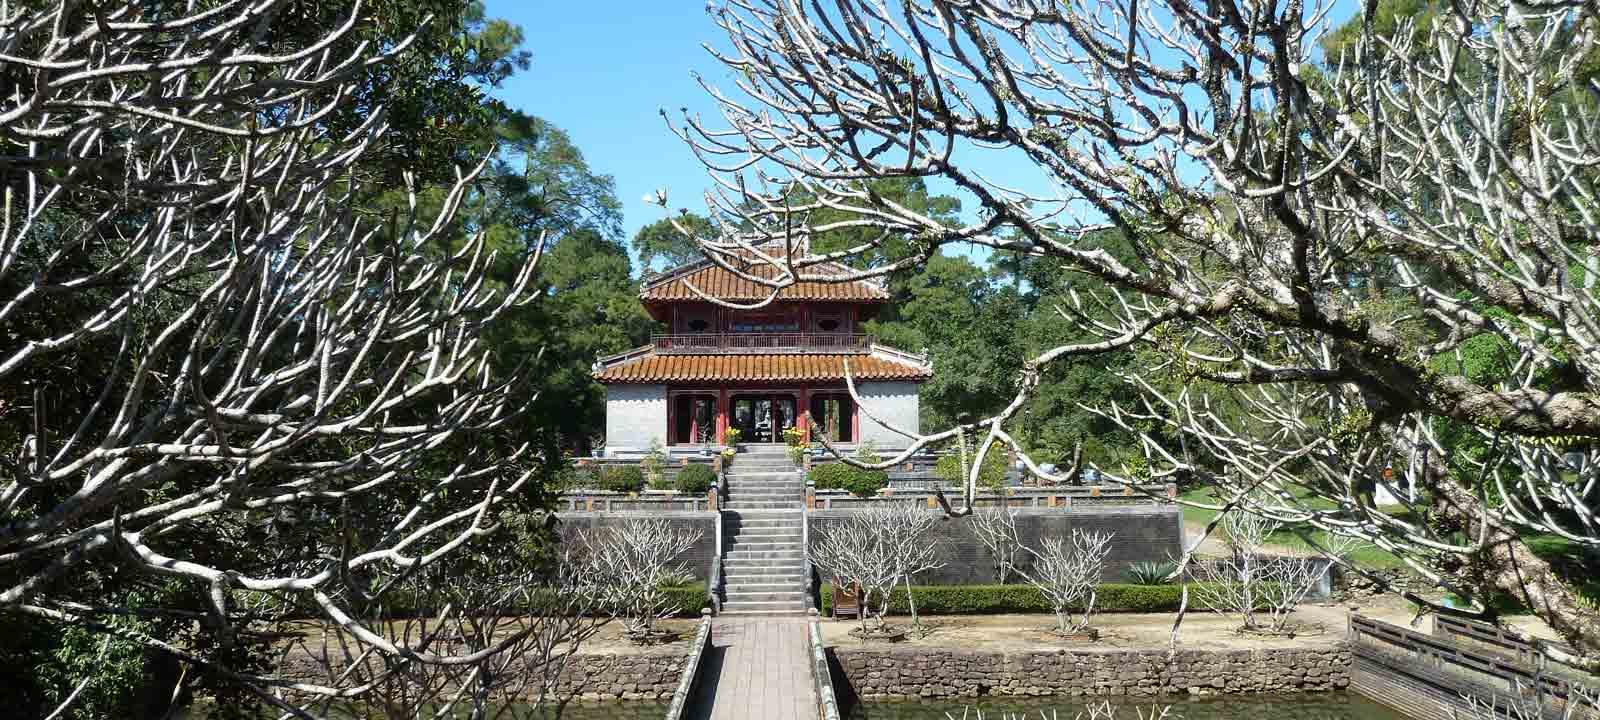 Le guide complet de voyage Hue